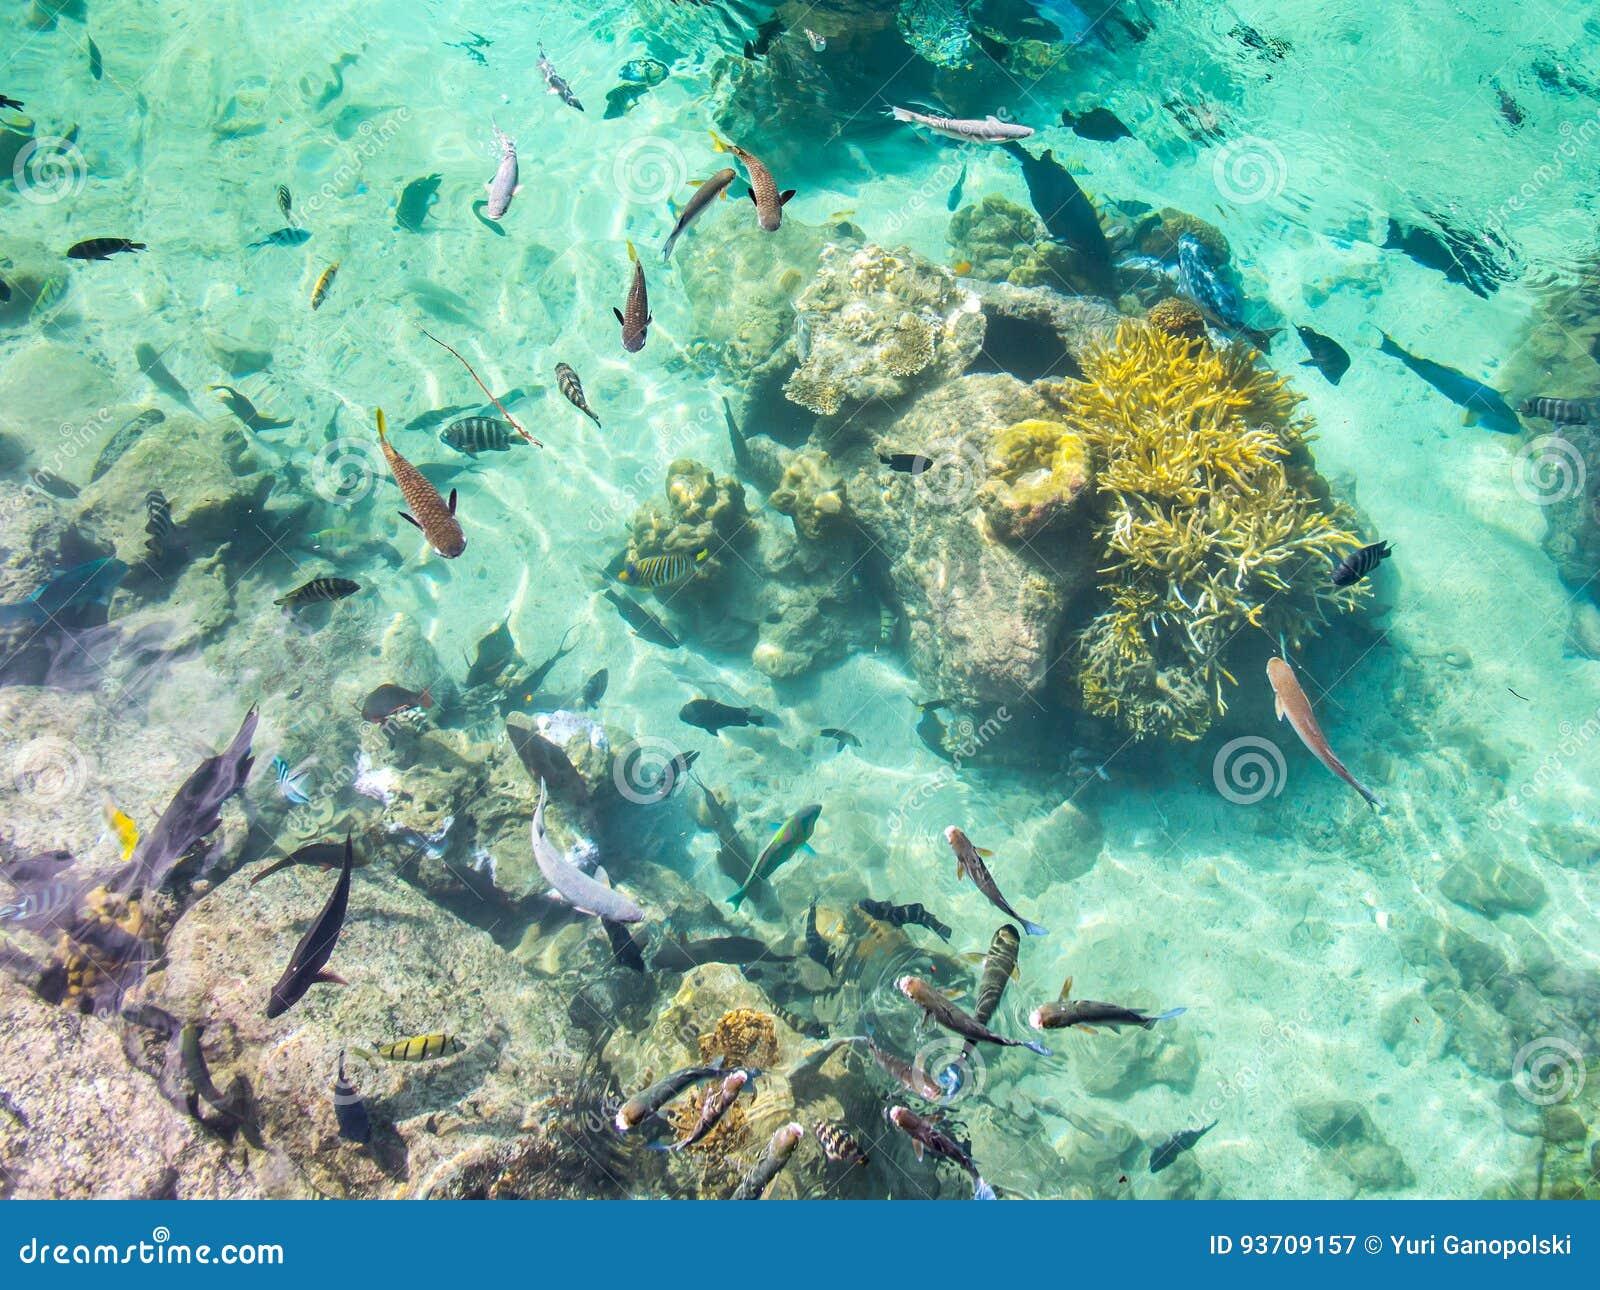 Lagoa de peixes tropical no hotel intercontinental do recurso e dos termas em Papeete, Tahiti, Polinésia francesa